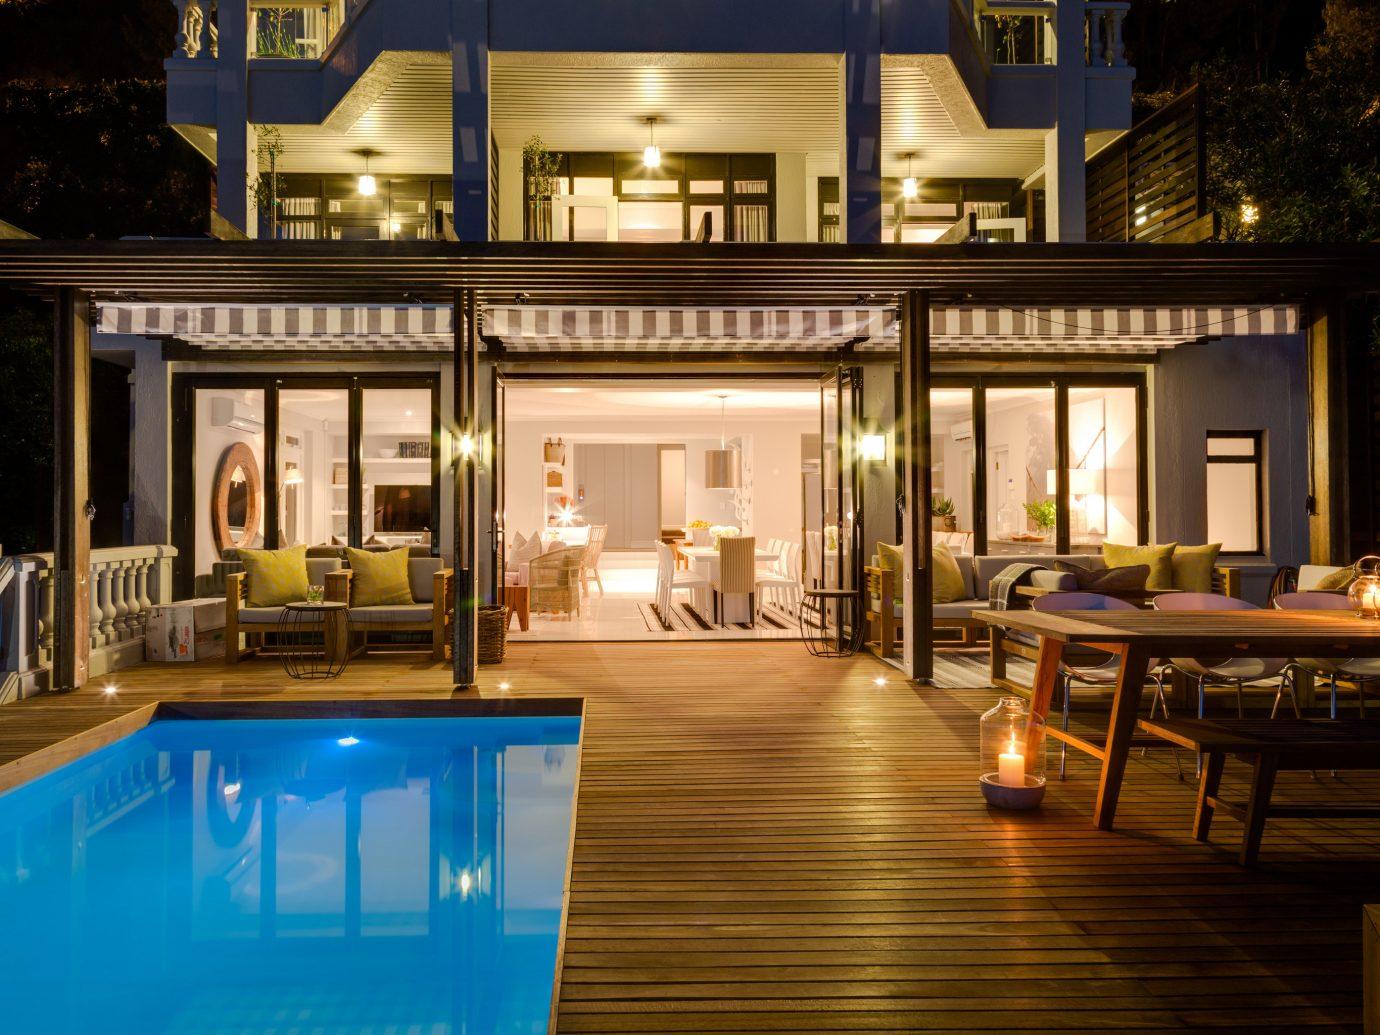 Hotels floor indoor property estate window building Resort home mansion swimming pool lighting interior design Villa Lobby